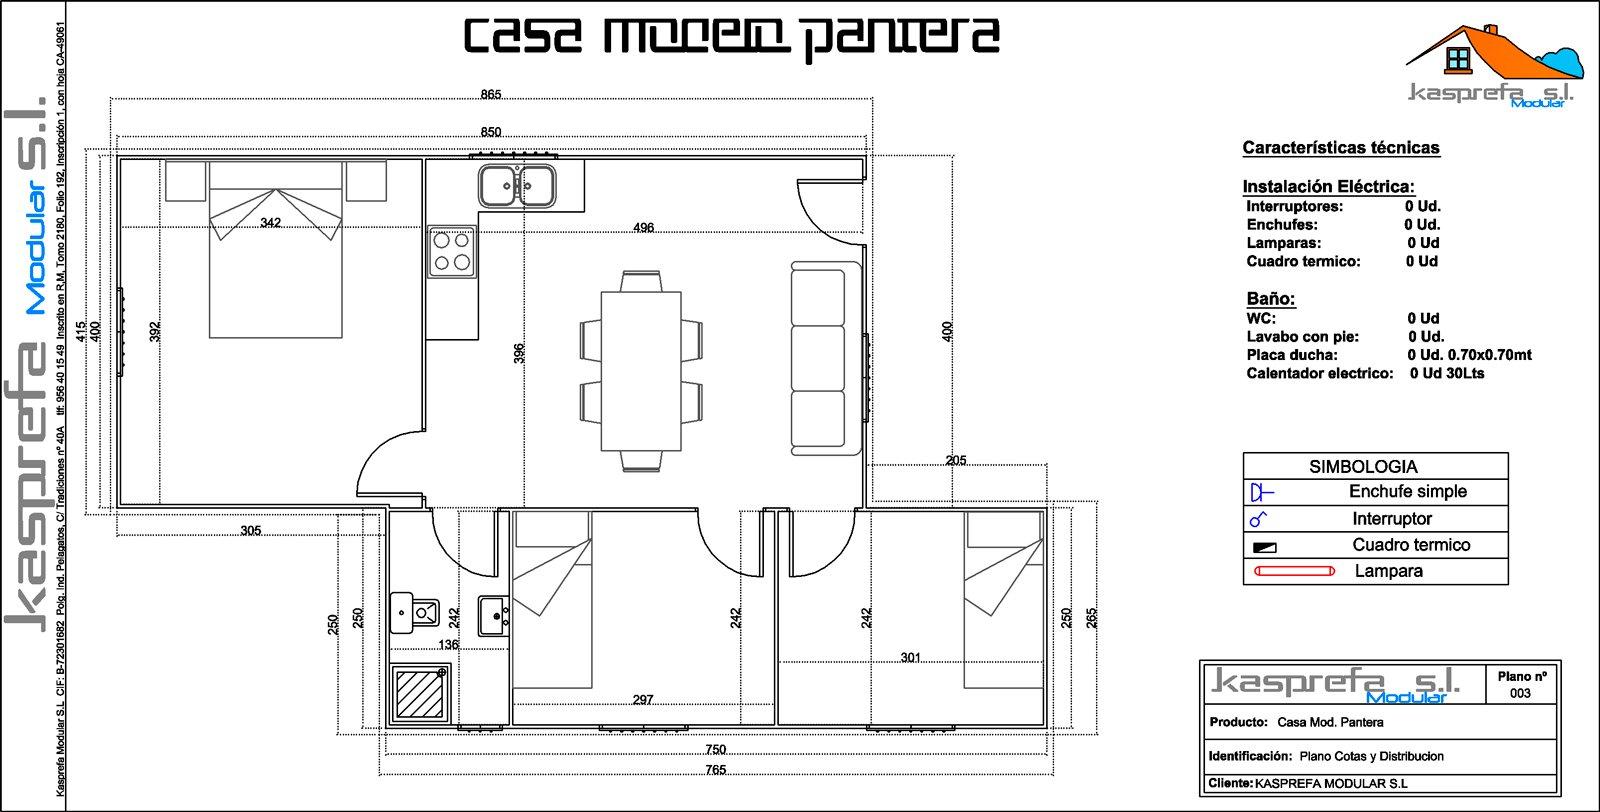 Casa pantera kasprefa modular s l - Distribucion casa ...